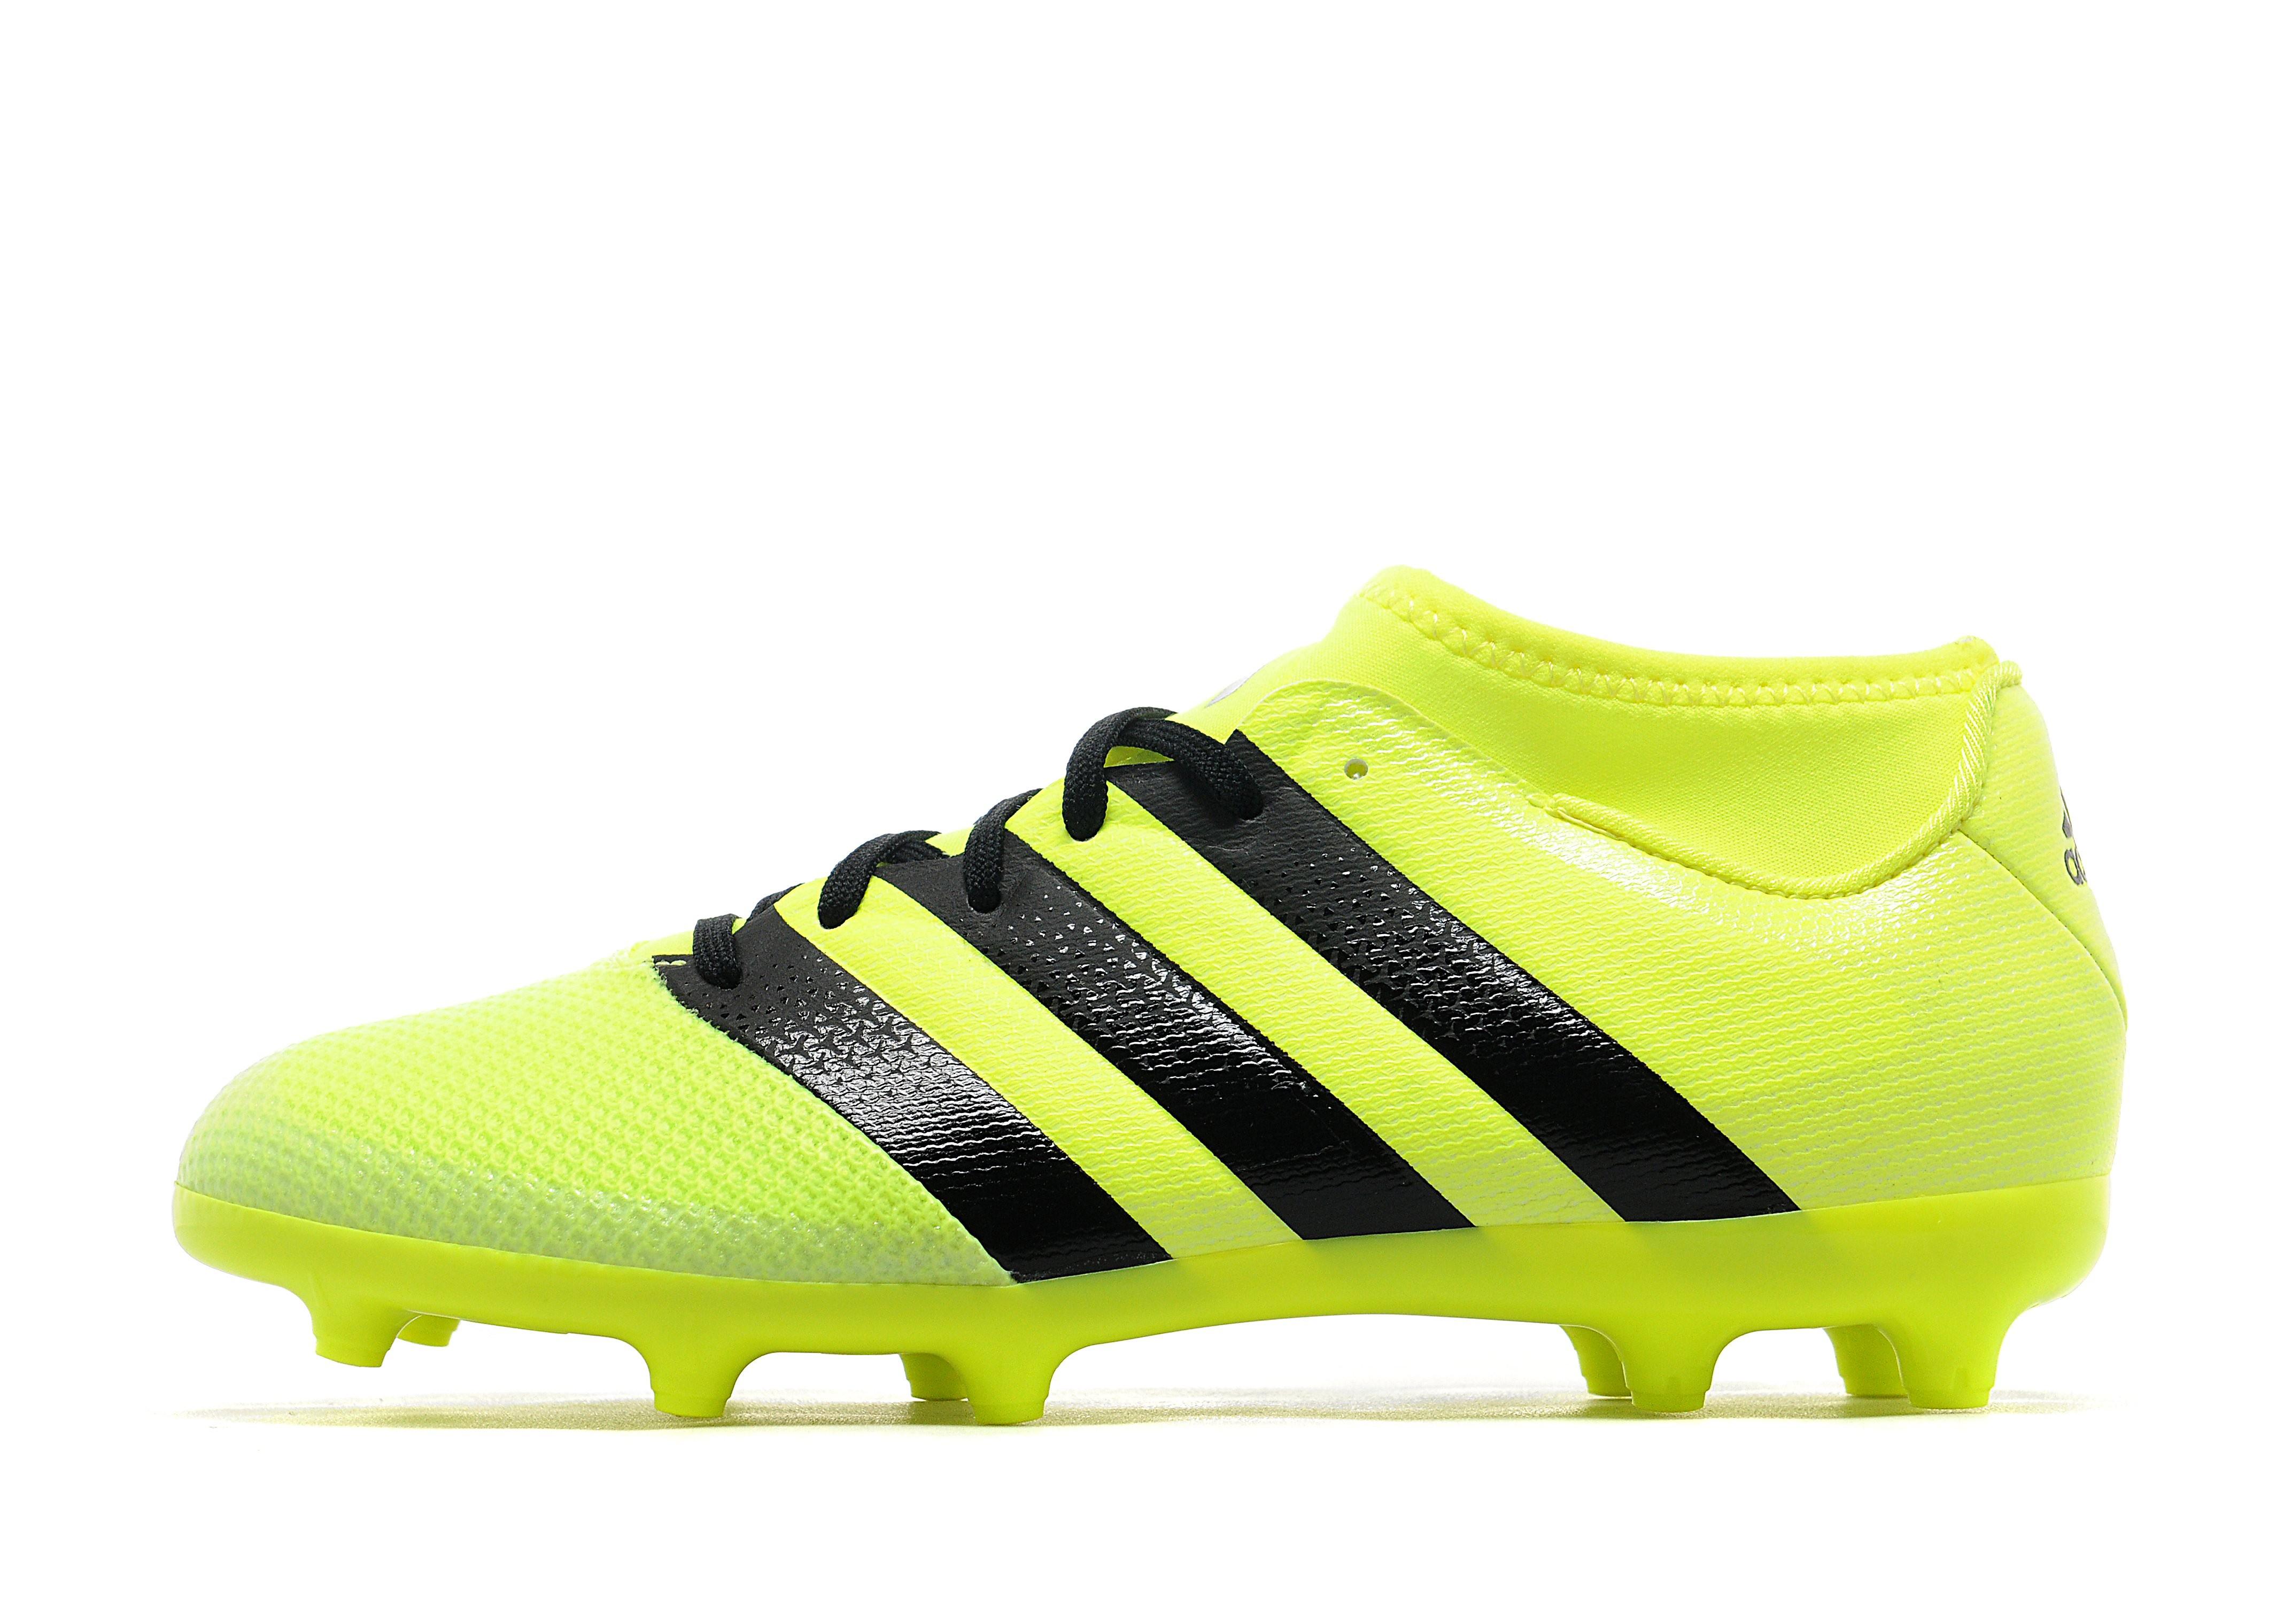 adidas Ace 16.3 Primemesh FG Junior - Yellow - Kids - Sports King Store c0c89b9a93168